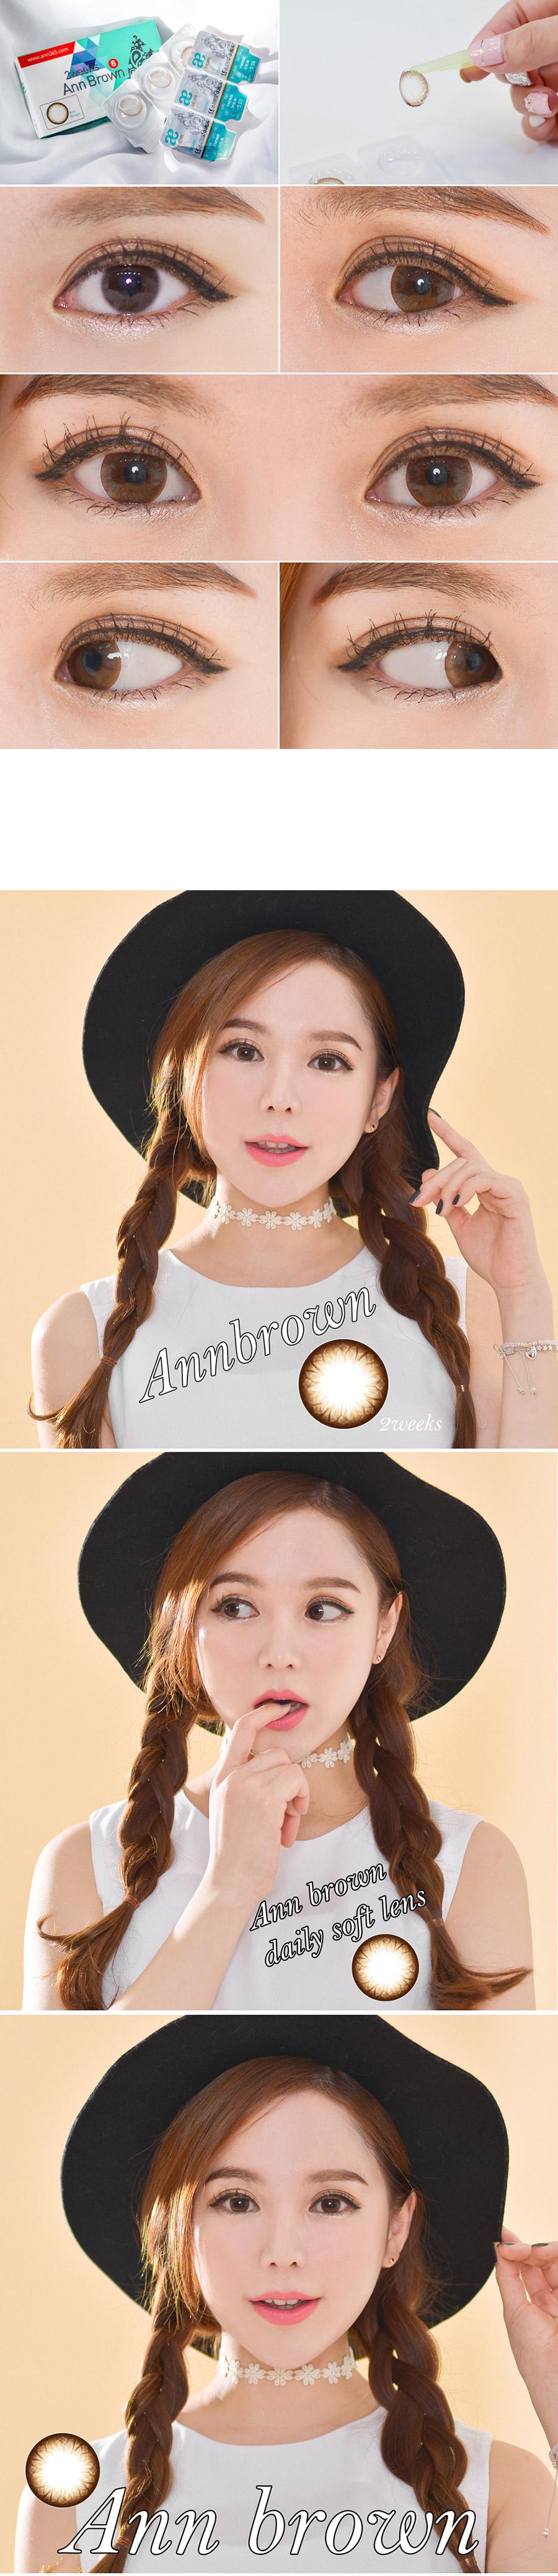 buy-ann-barbie-brown-prescription-colored-contacts-klenspop-5.jpg